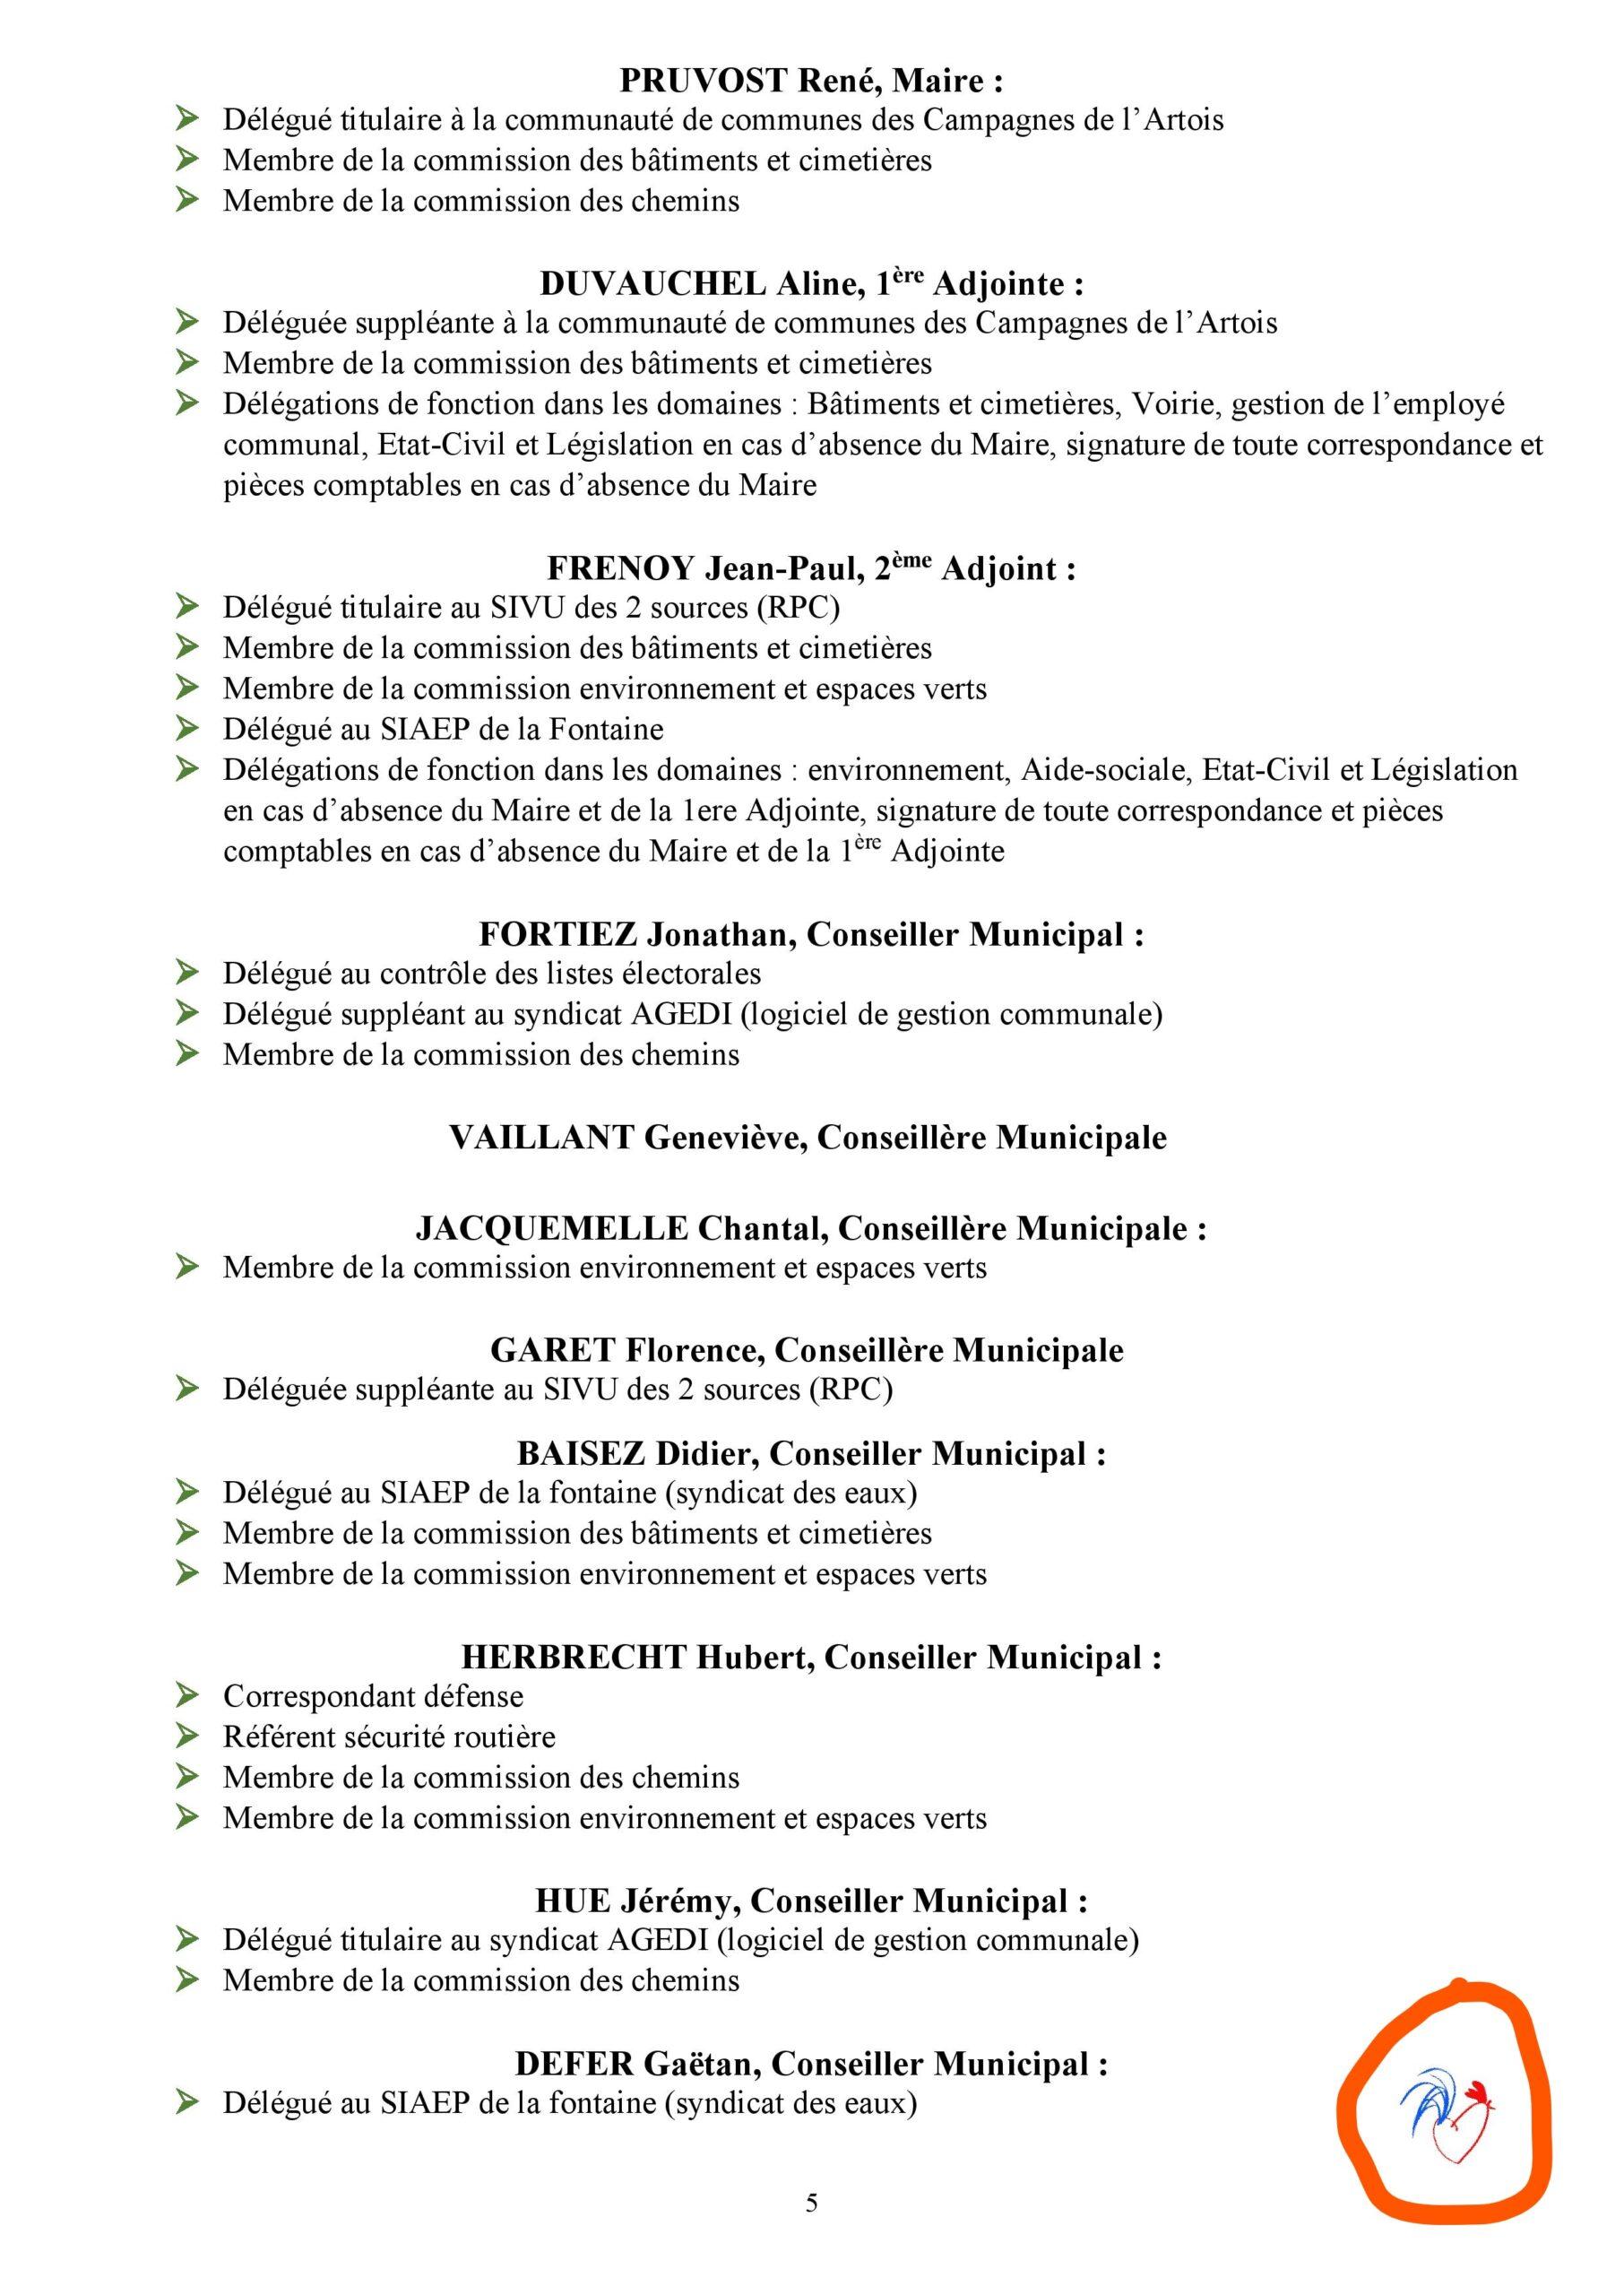 Inkedbulletin municipal septembre 2020-page-005_LI